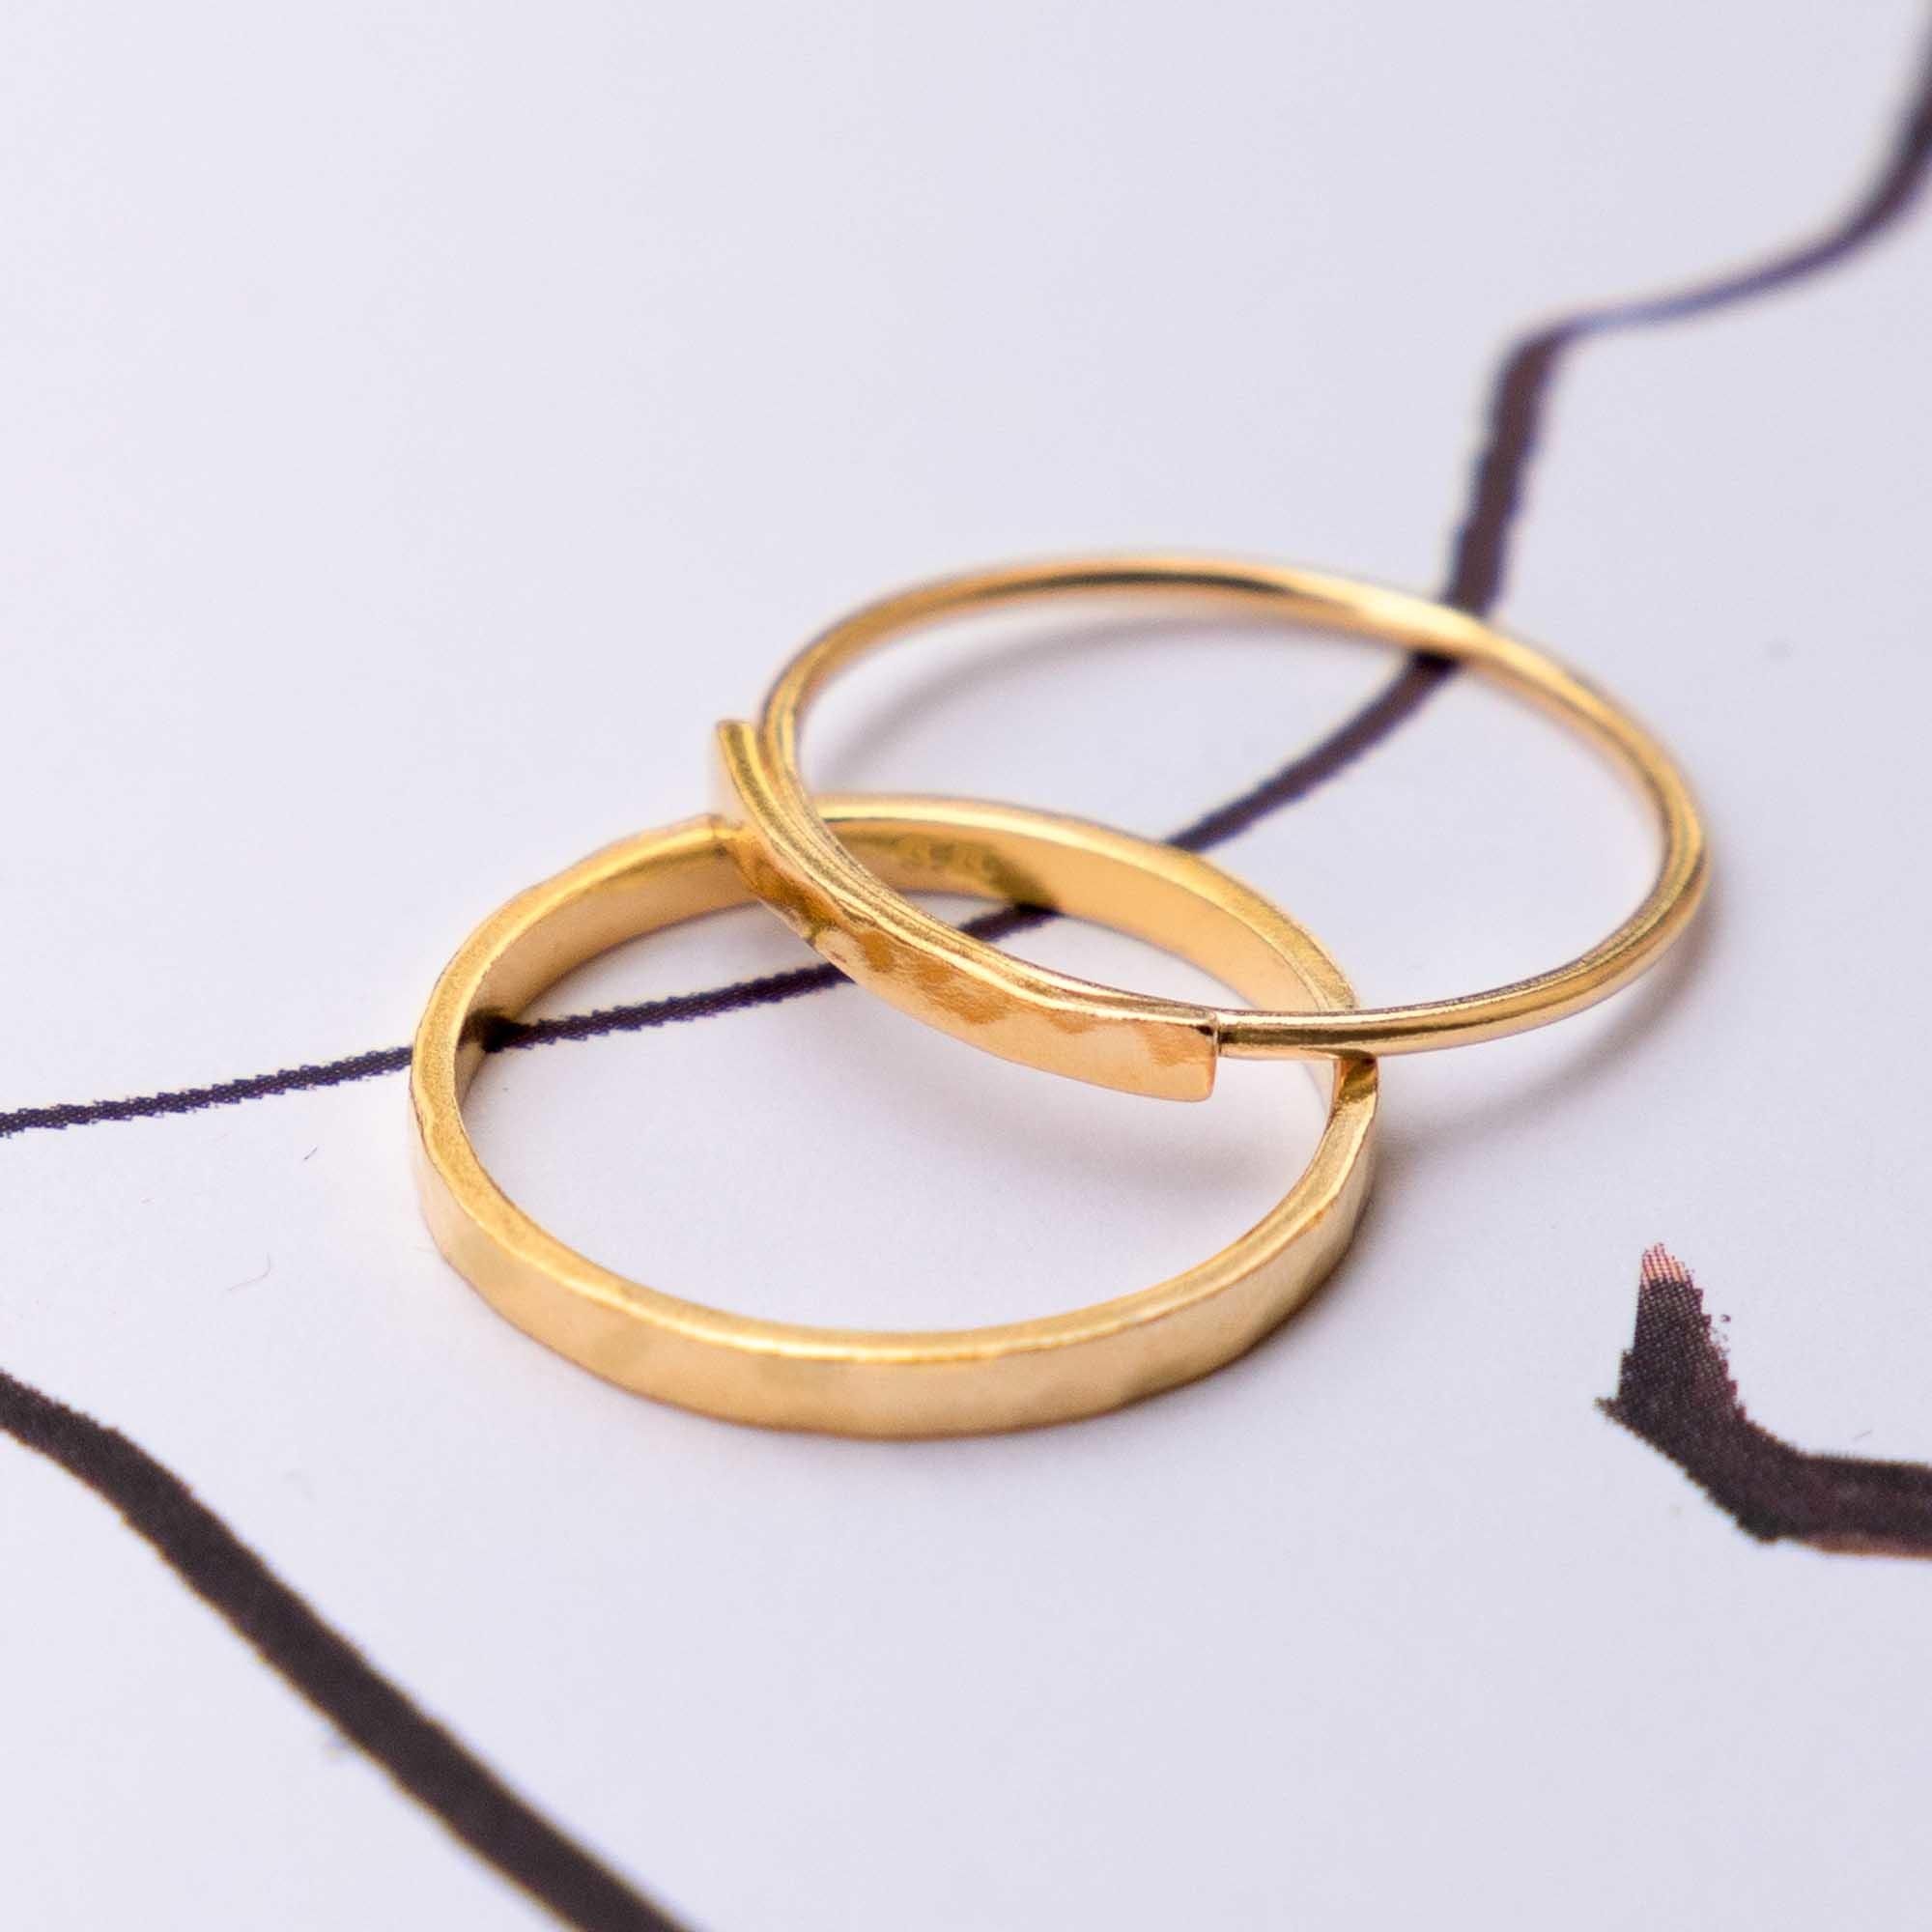 Violet Hamden Sisterhood Moonlit Ring aus goldfarbenem 925 Sterlingsilber